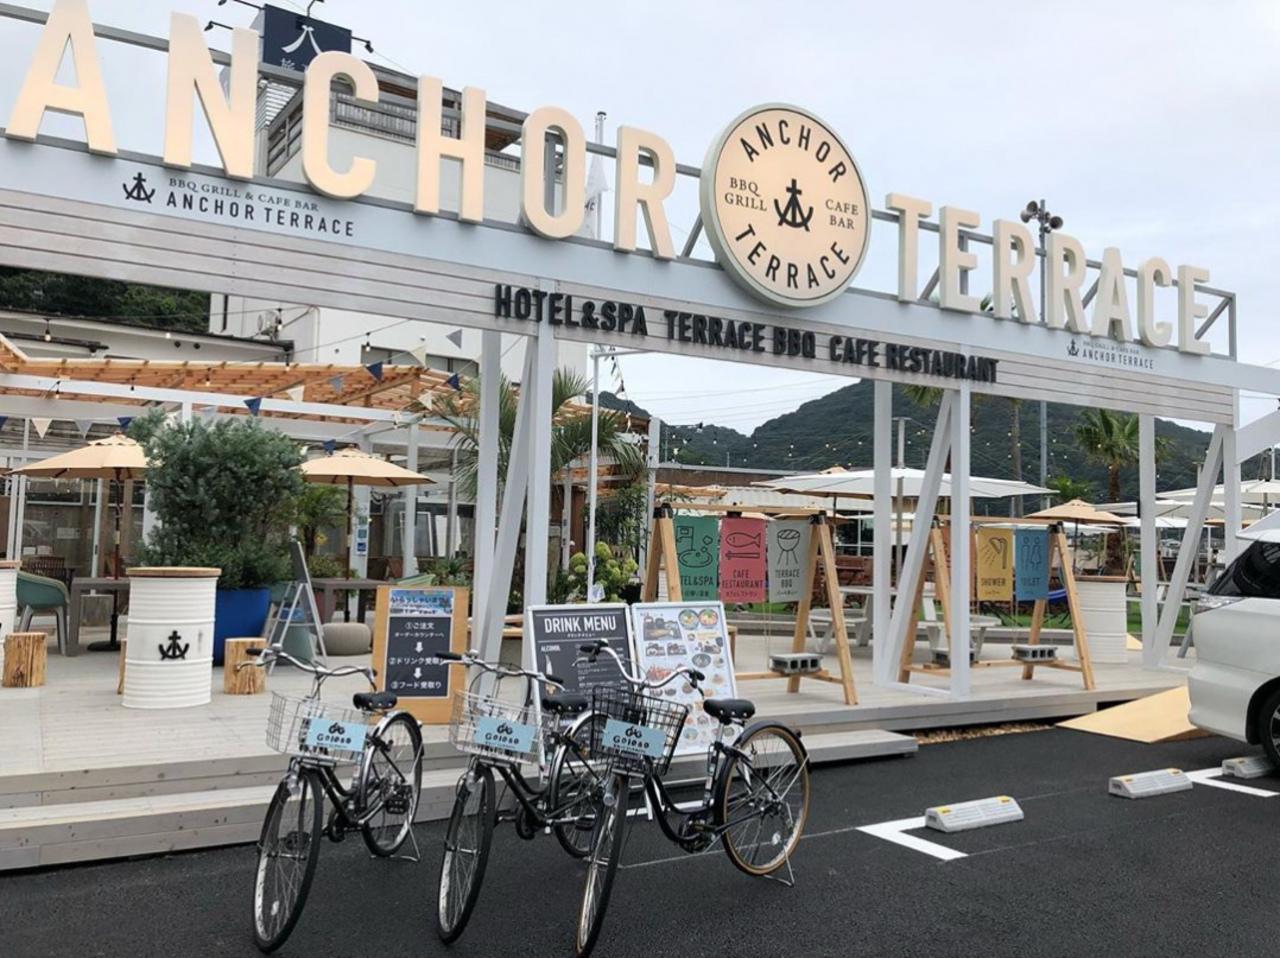 BBQグリル&カフェレストラン...静岡県伊東市宇佐美の「アンカーテラス」